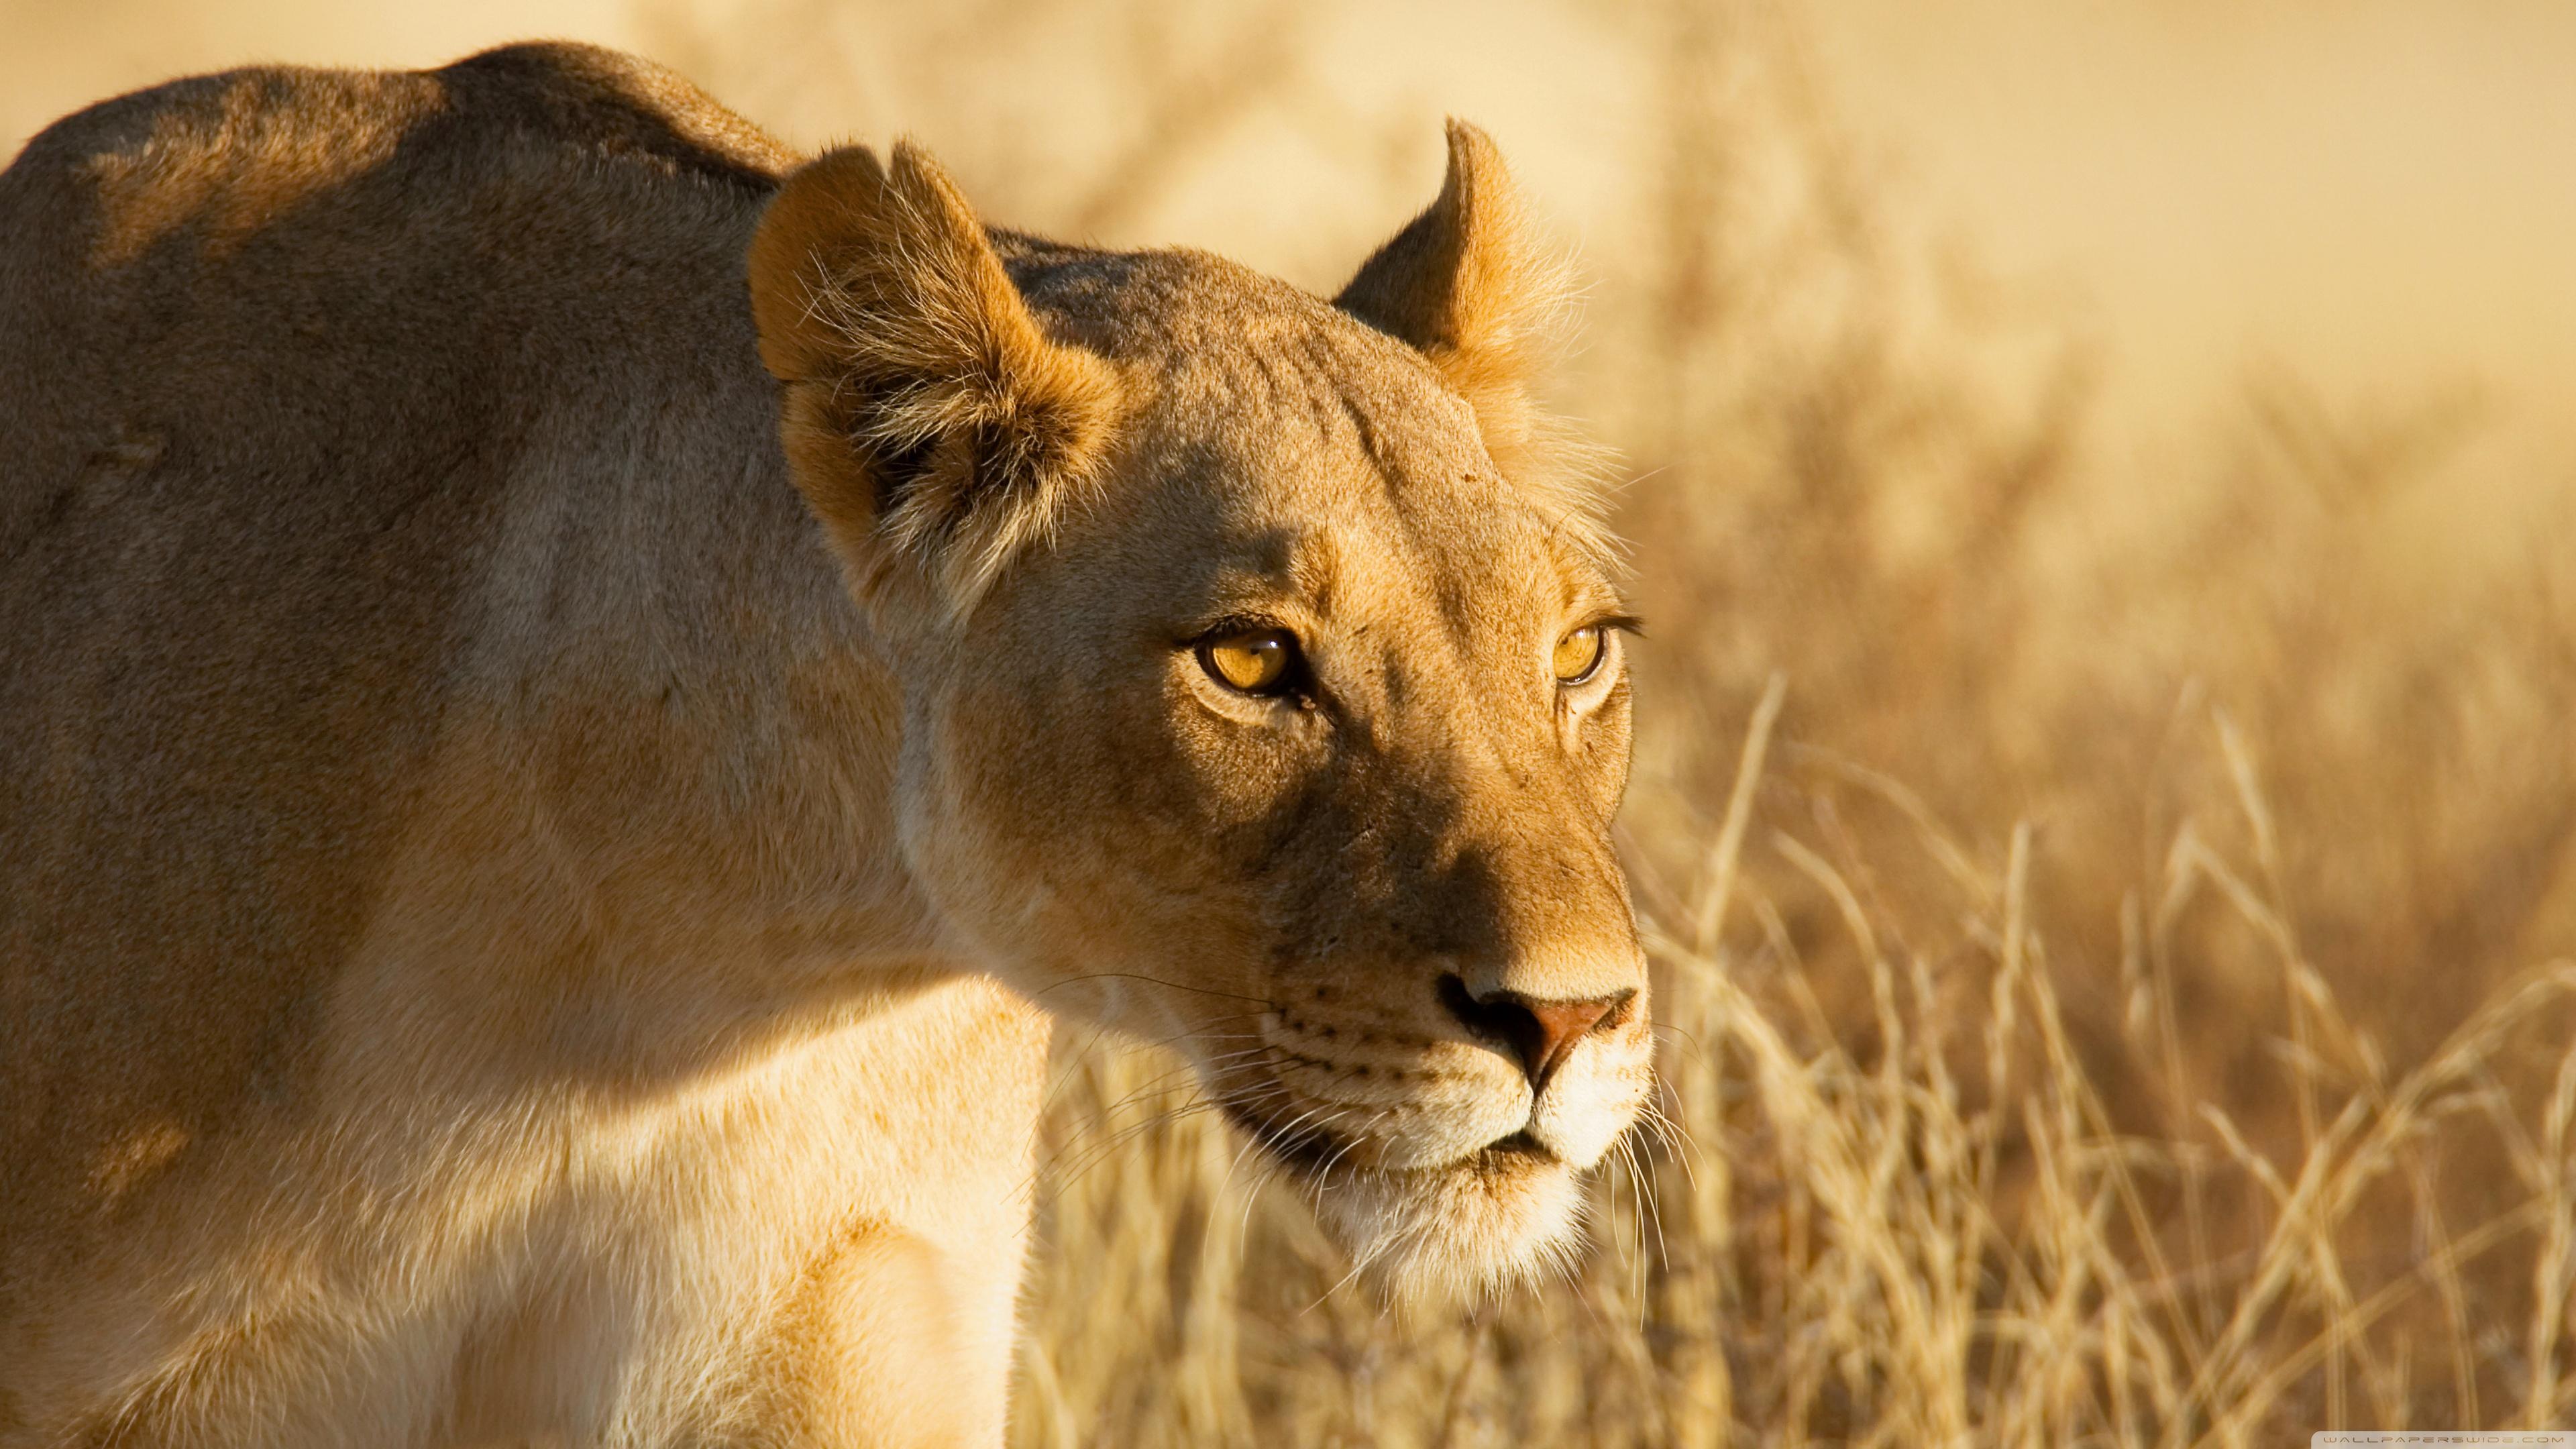 Hunting Lioness ❤ 4K HD Desktop Wallpaper for 4K Ultra HD TV ...